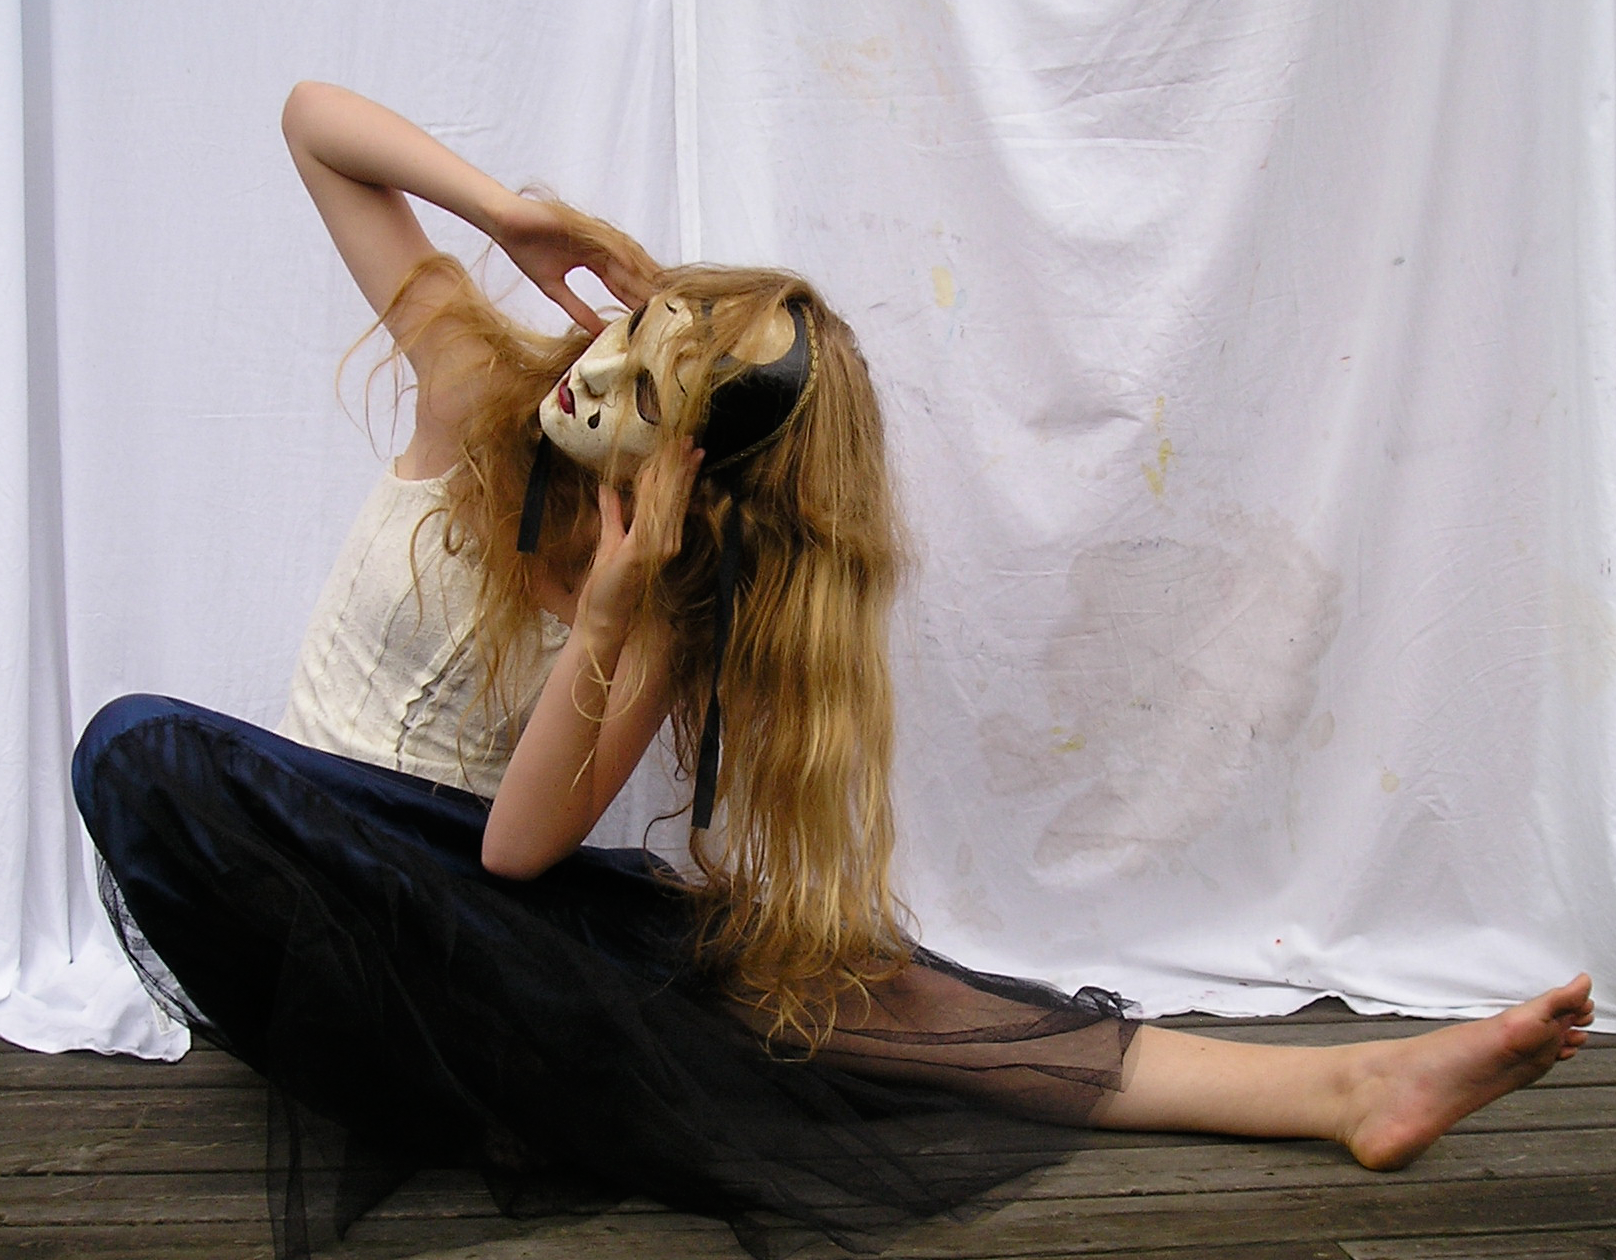 Blond Female 1 6 by SeaOfFireStock - sar���n k�z avatarlar�